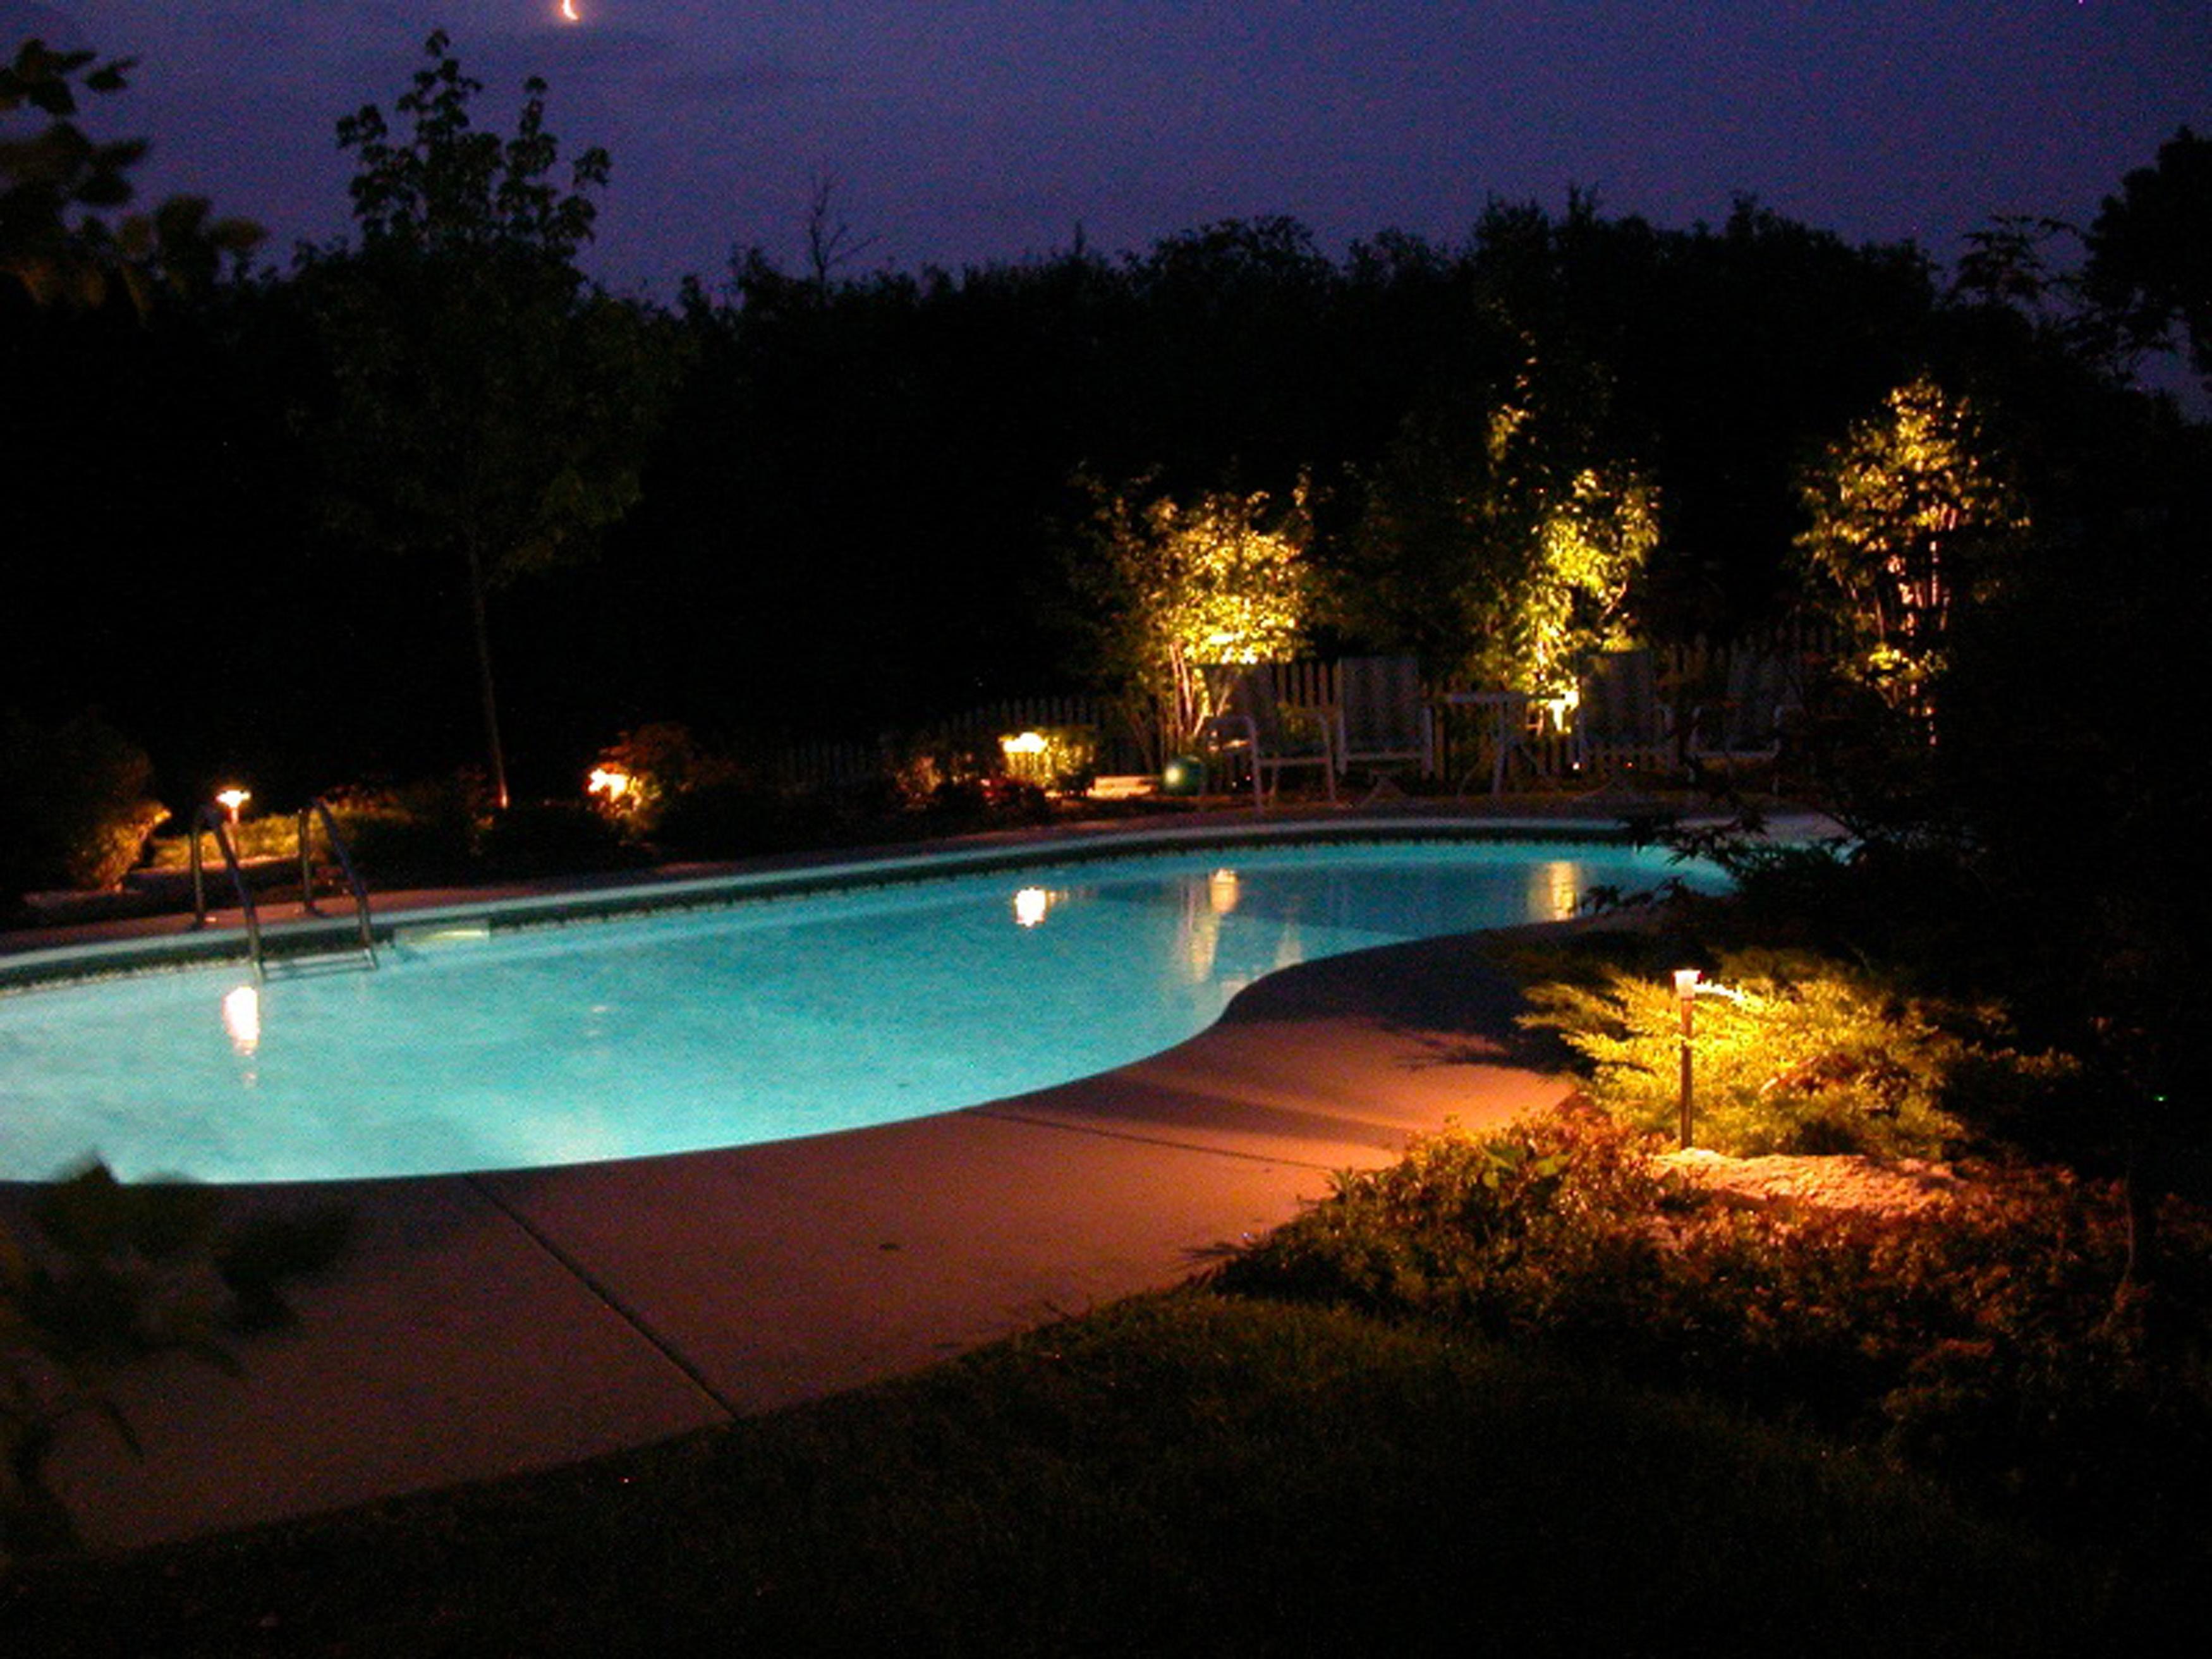 Amazing Outdoor Lighting For Pool Area Lighting Pool Area Lighting (View 26 of 28)